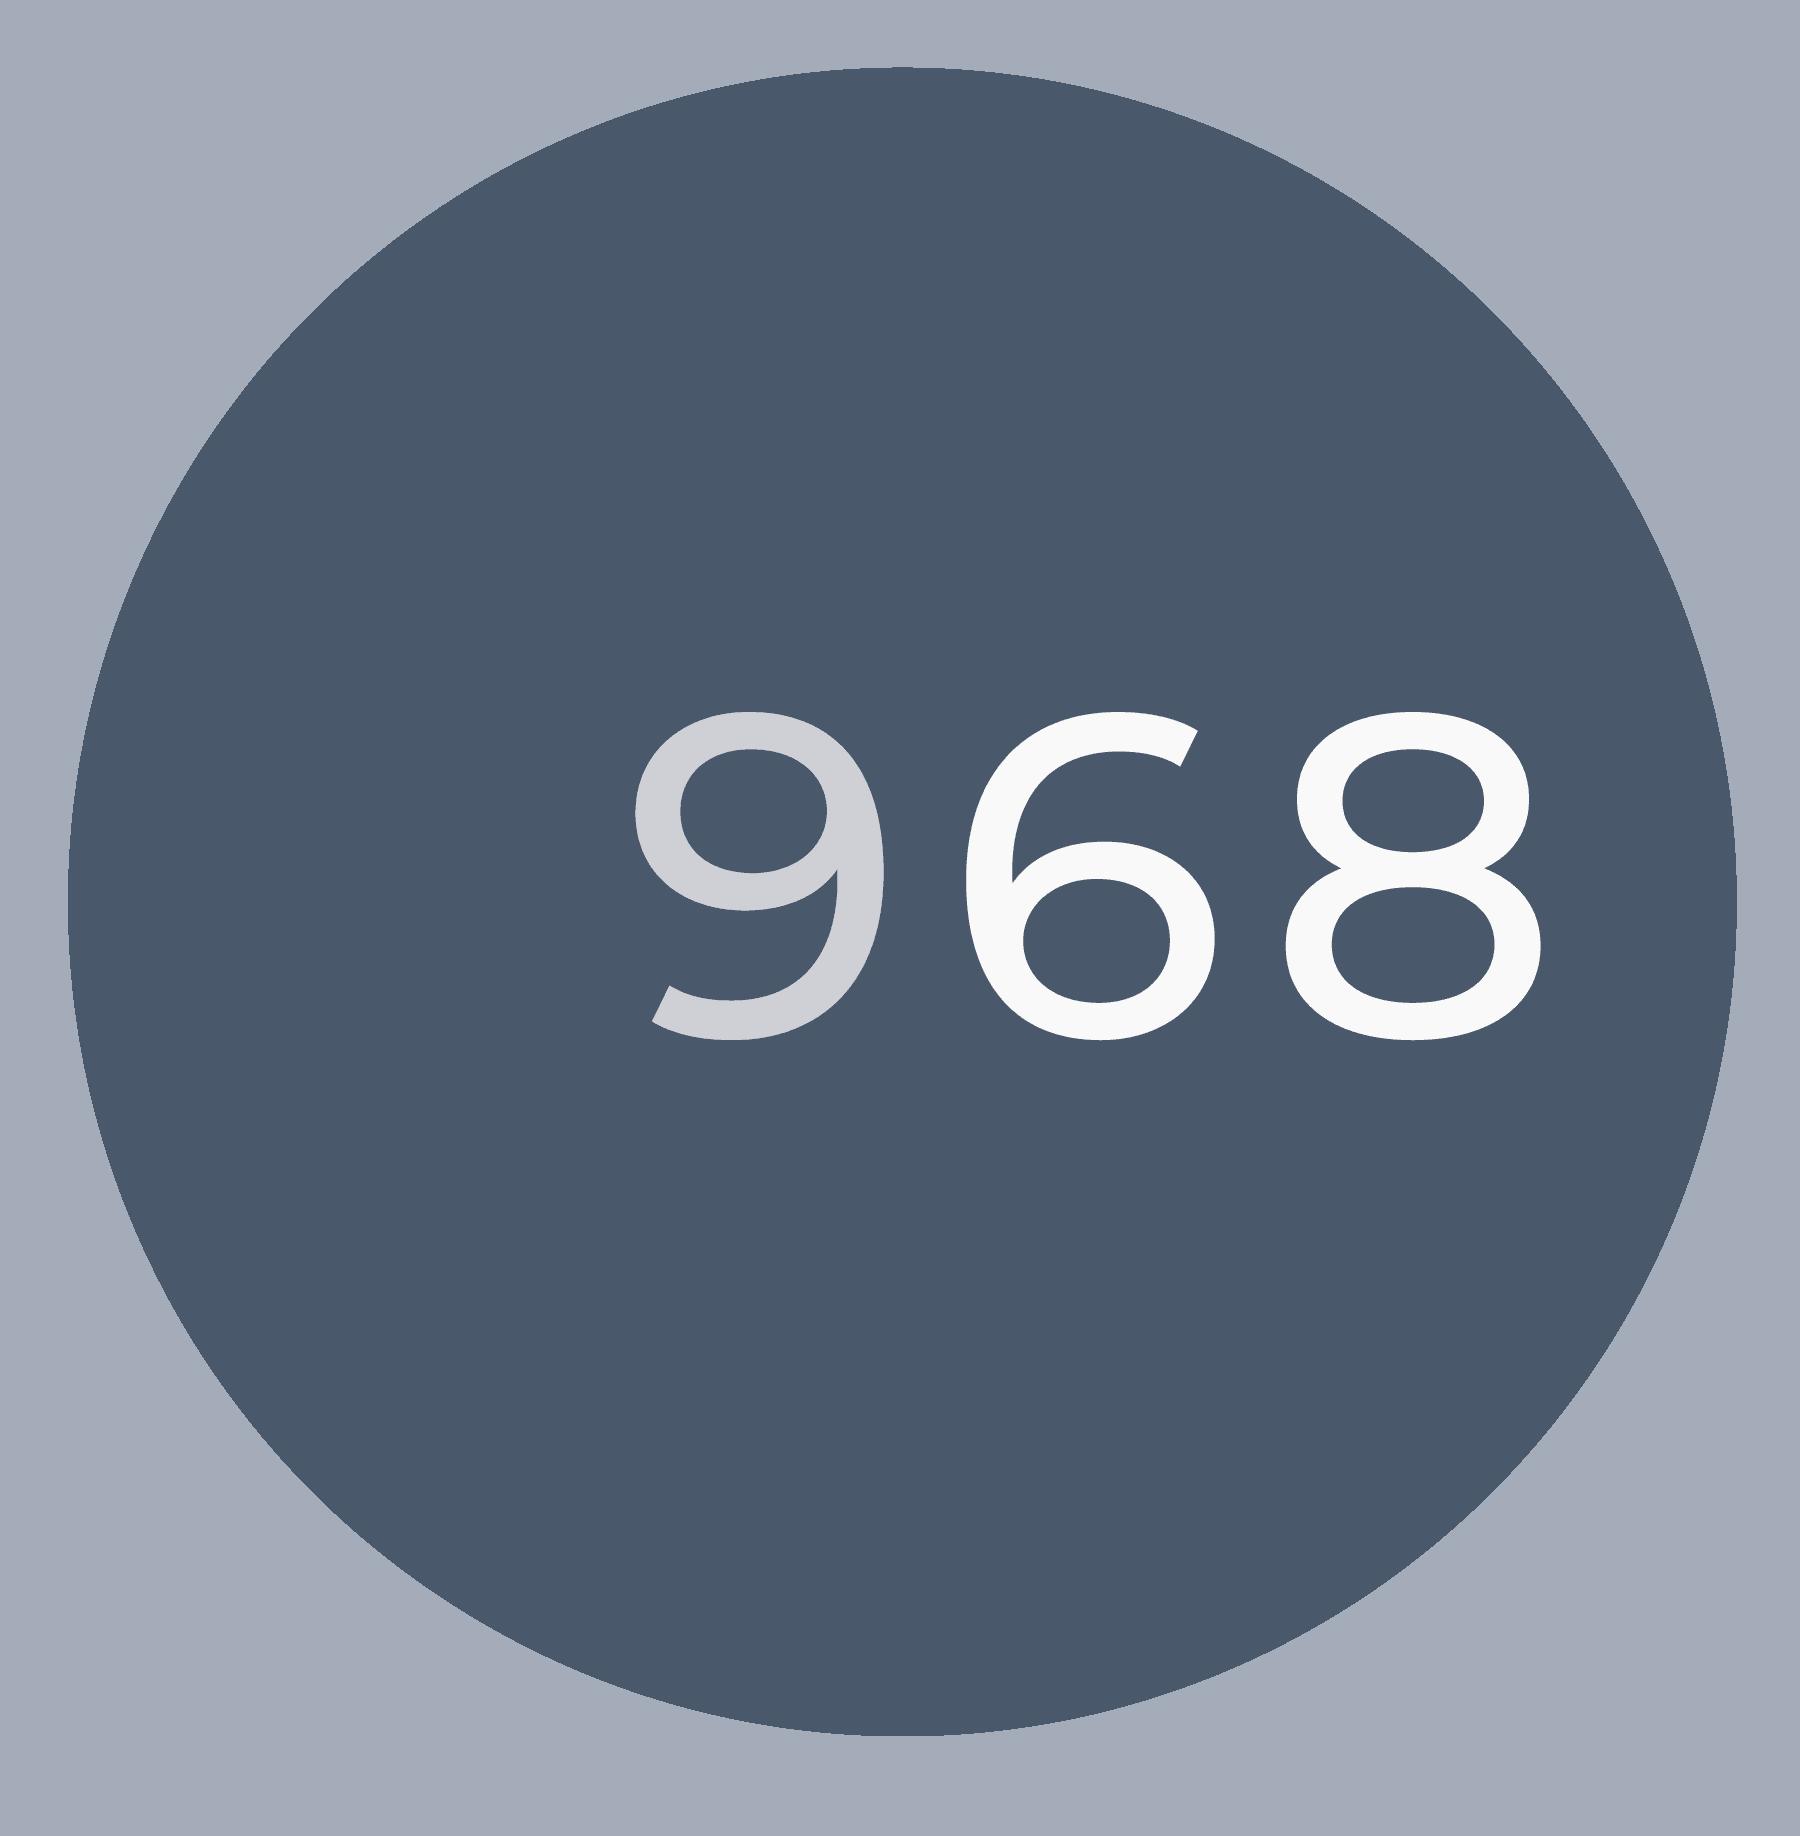 Bungalow968